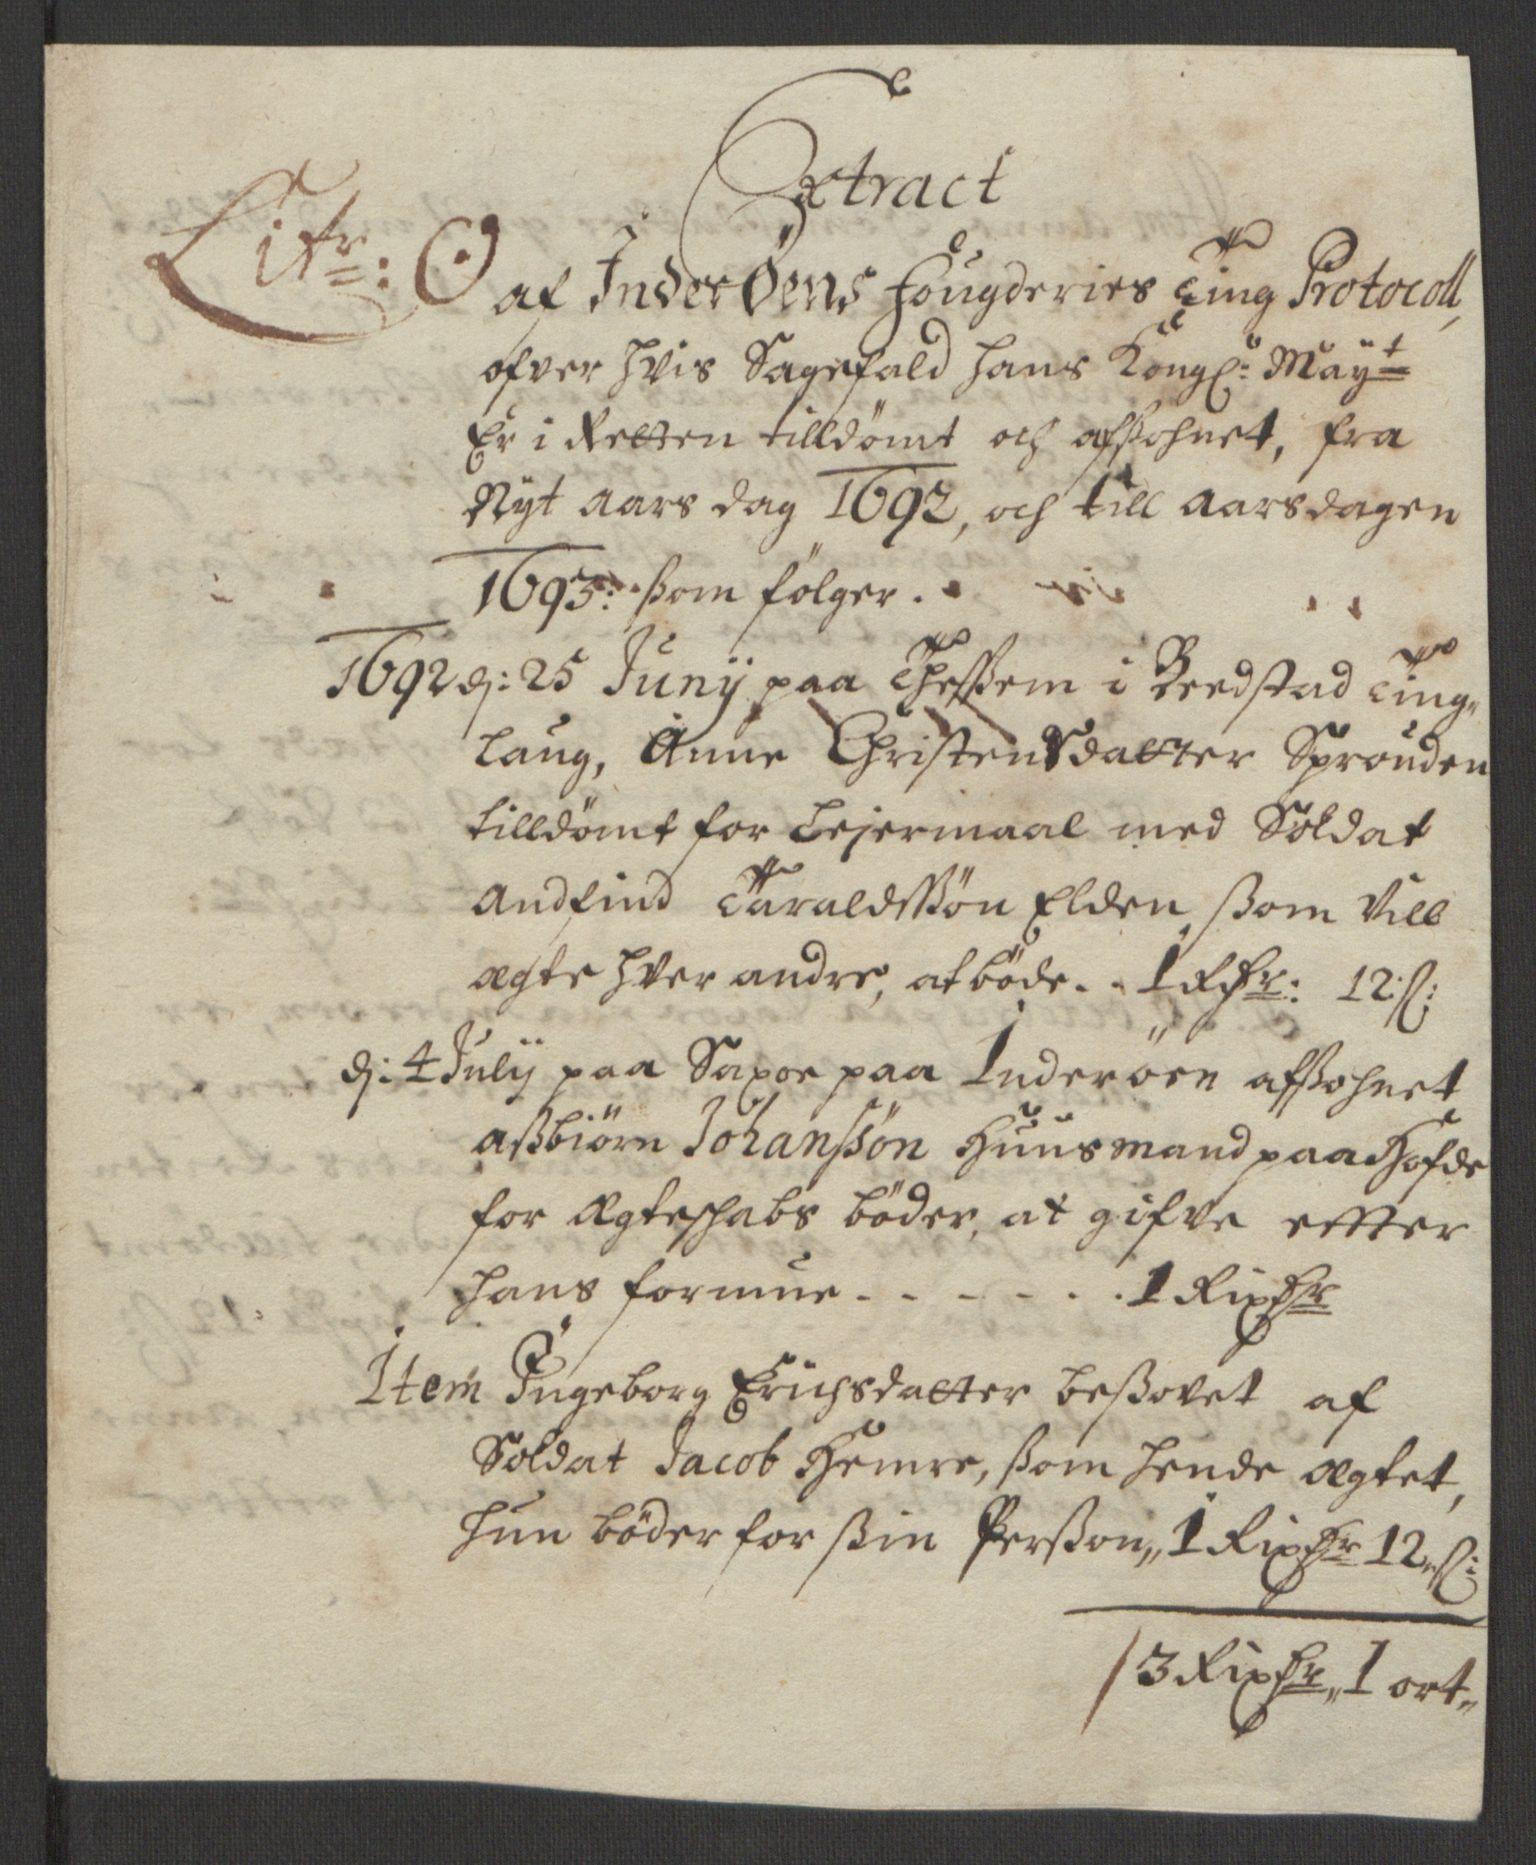 RA, Rentekammeret inntil 1814, Reviderte regnskaper, Fogderegnskap, R63/L4308: Fogderegnskap Inderøy, 1692-1694, s. 197